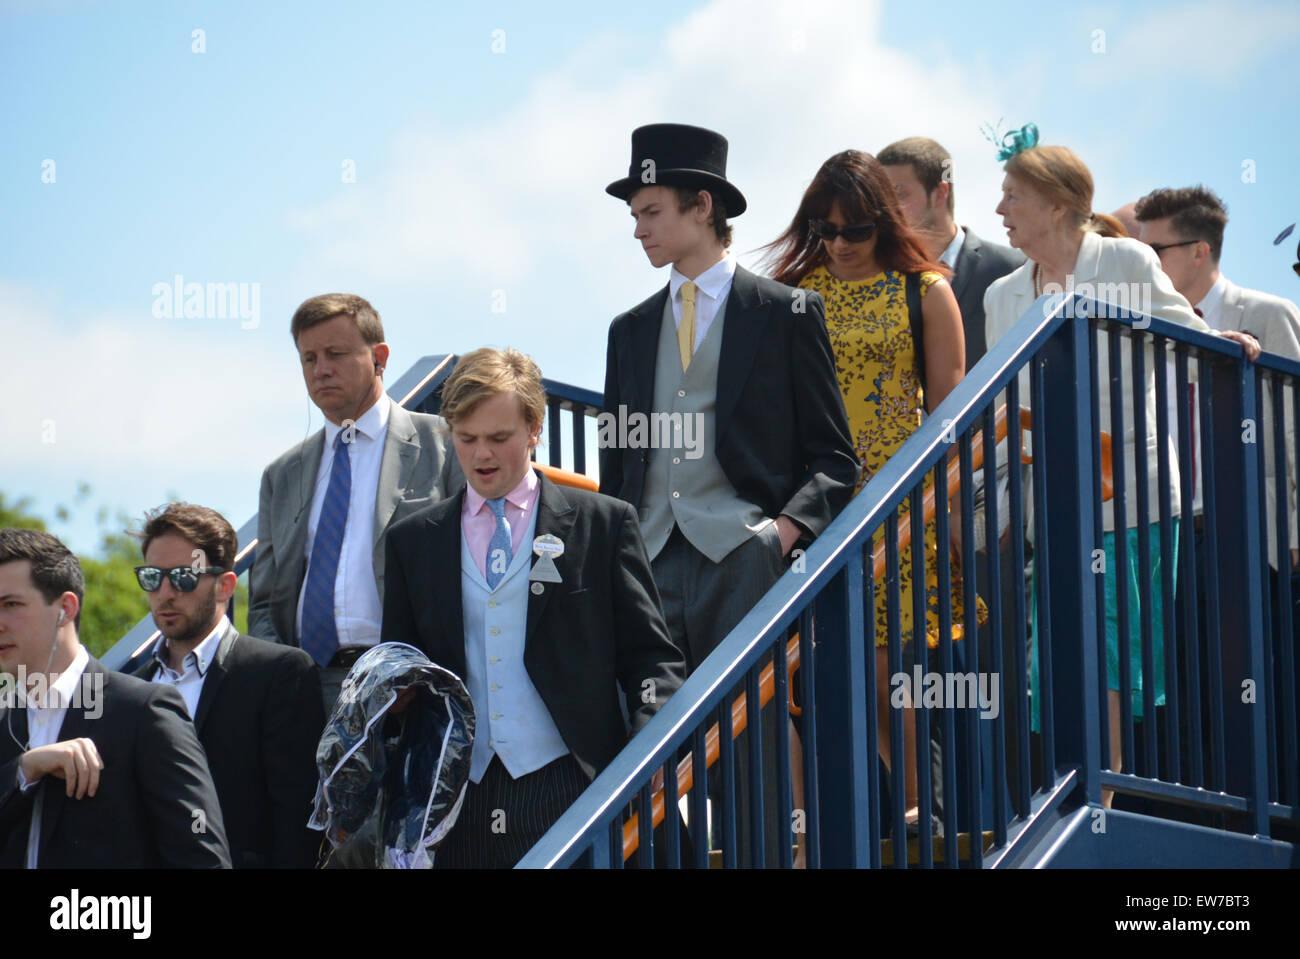 Ascot, Berkshire, UK. 19th June 2015. The annual Royal Ascot Races Credit:  Matthew Chattle/Alamy Live News Stock Photo